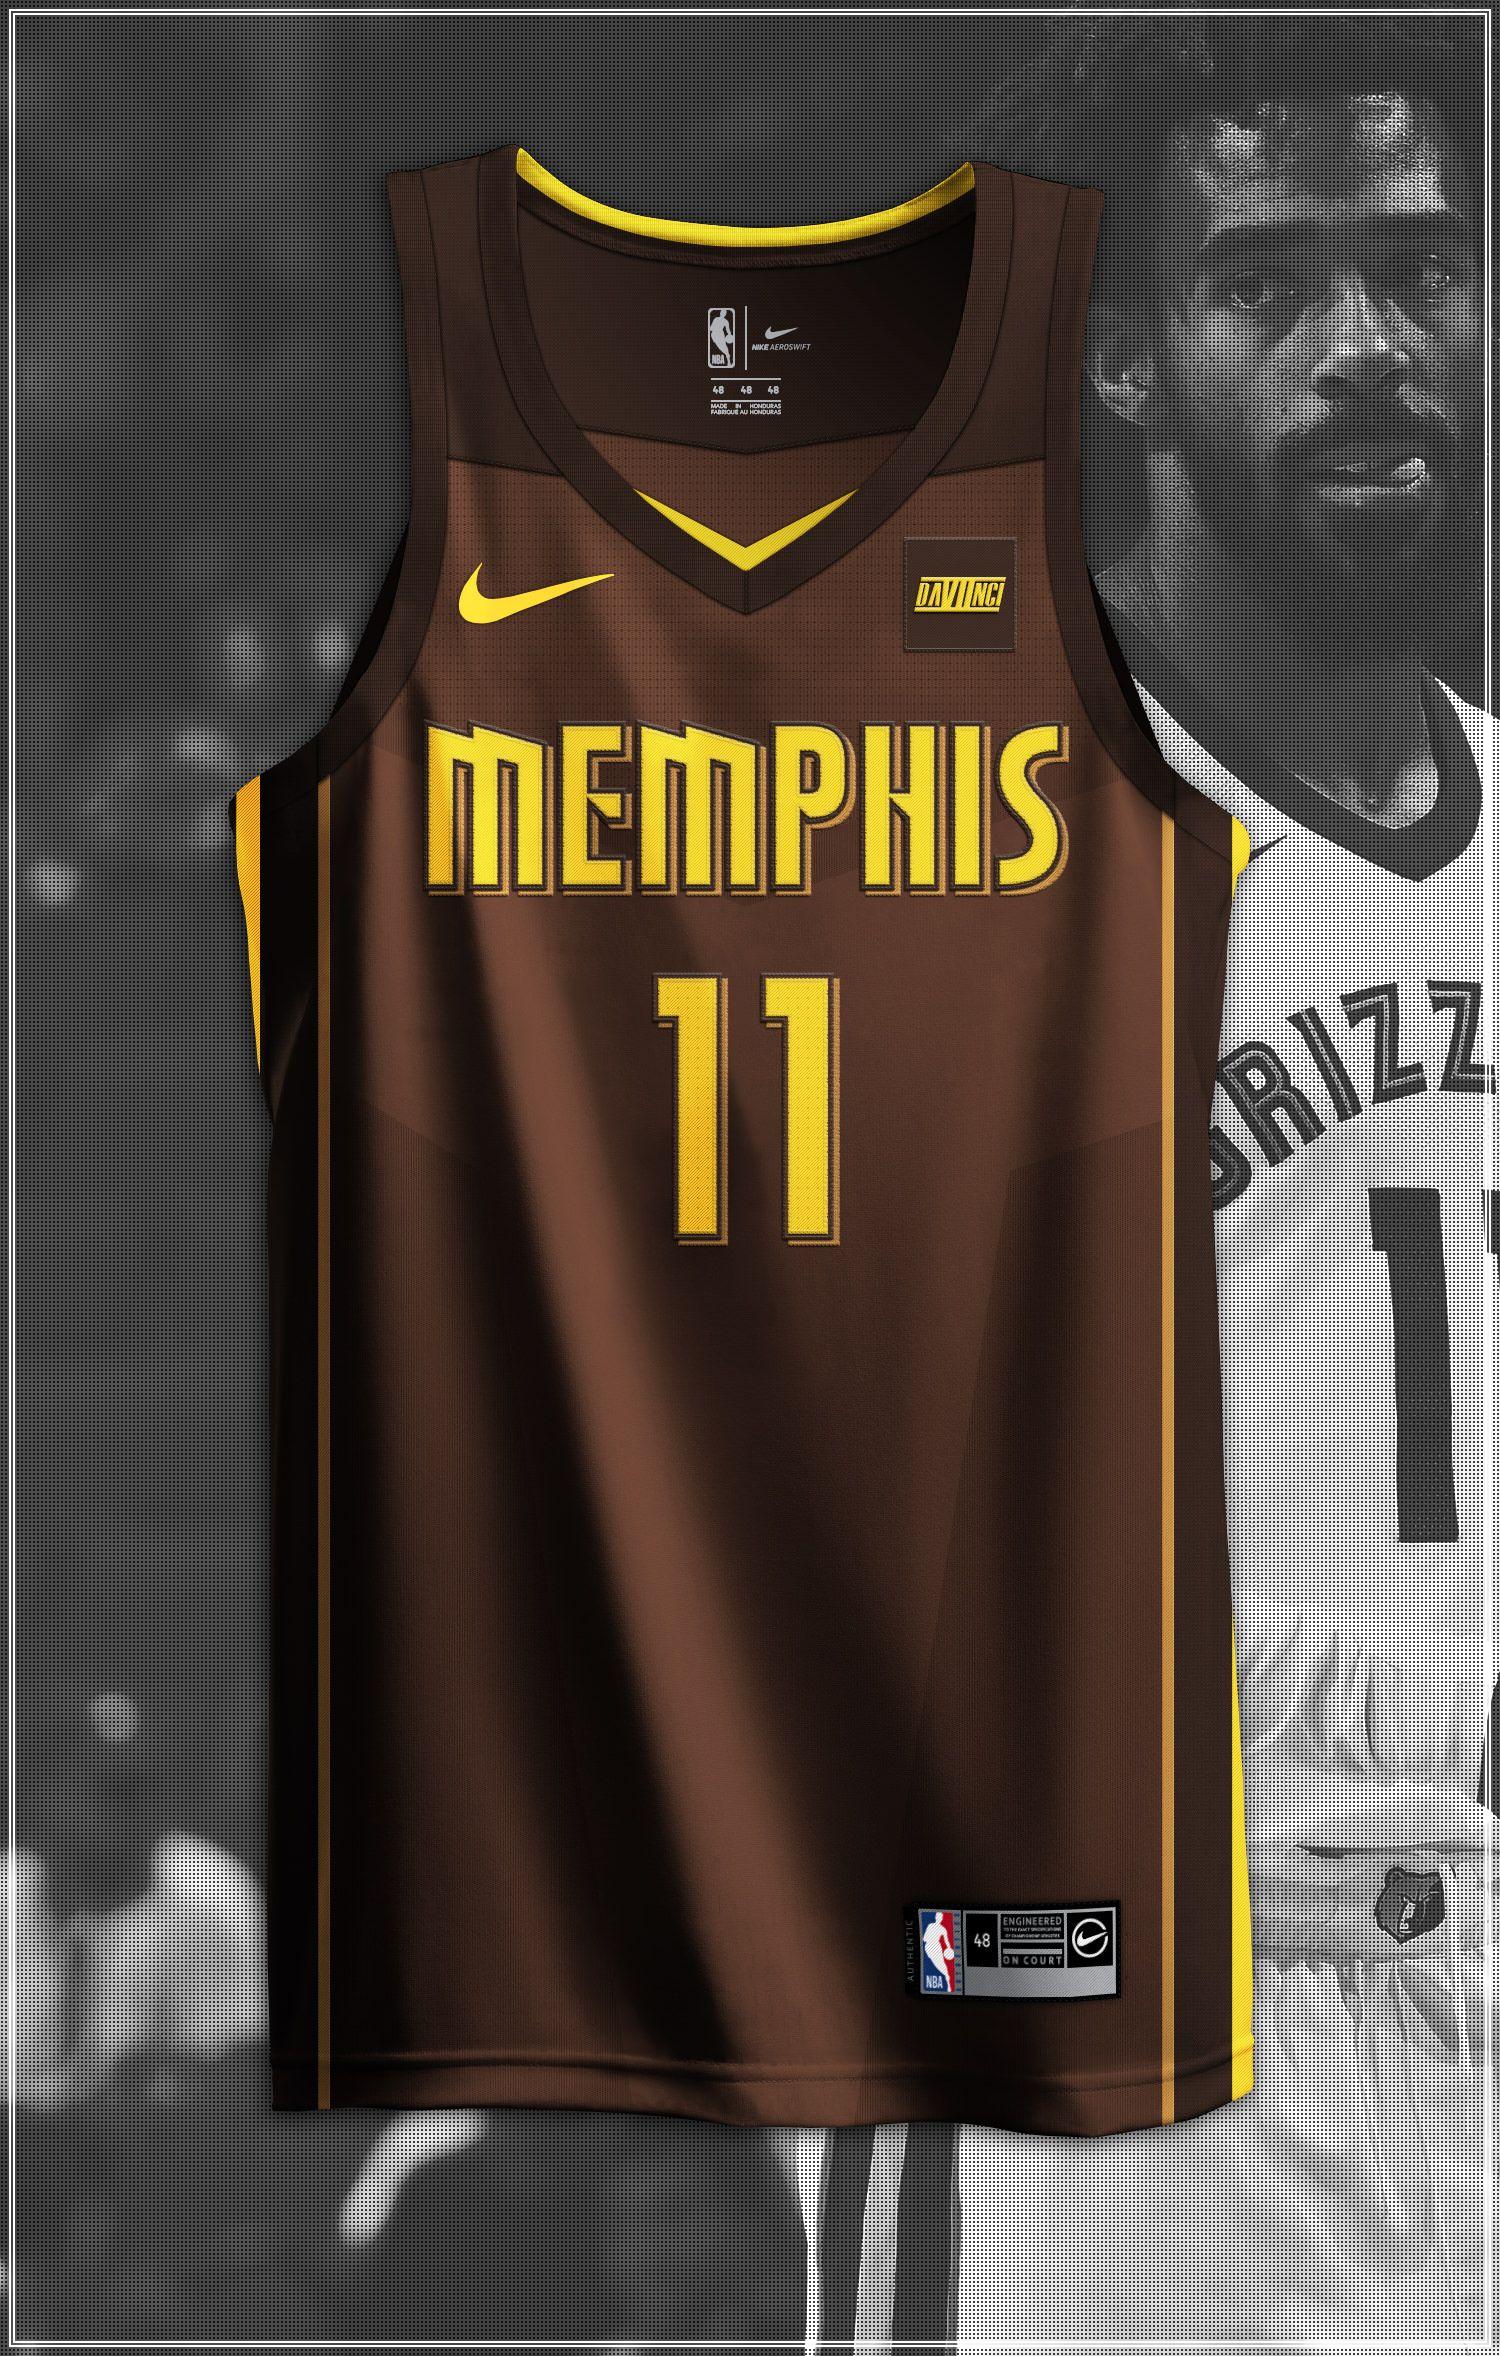 sOmVj7S.jpg Basketball design, Basketball uniforms